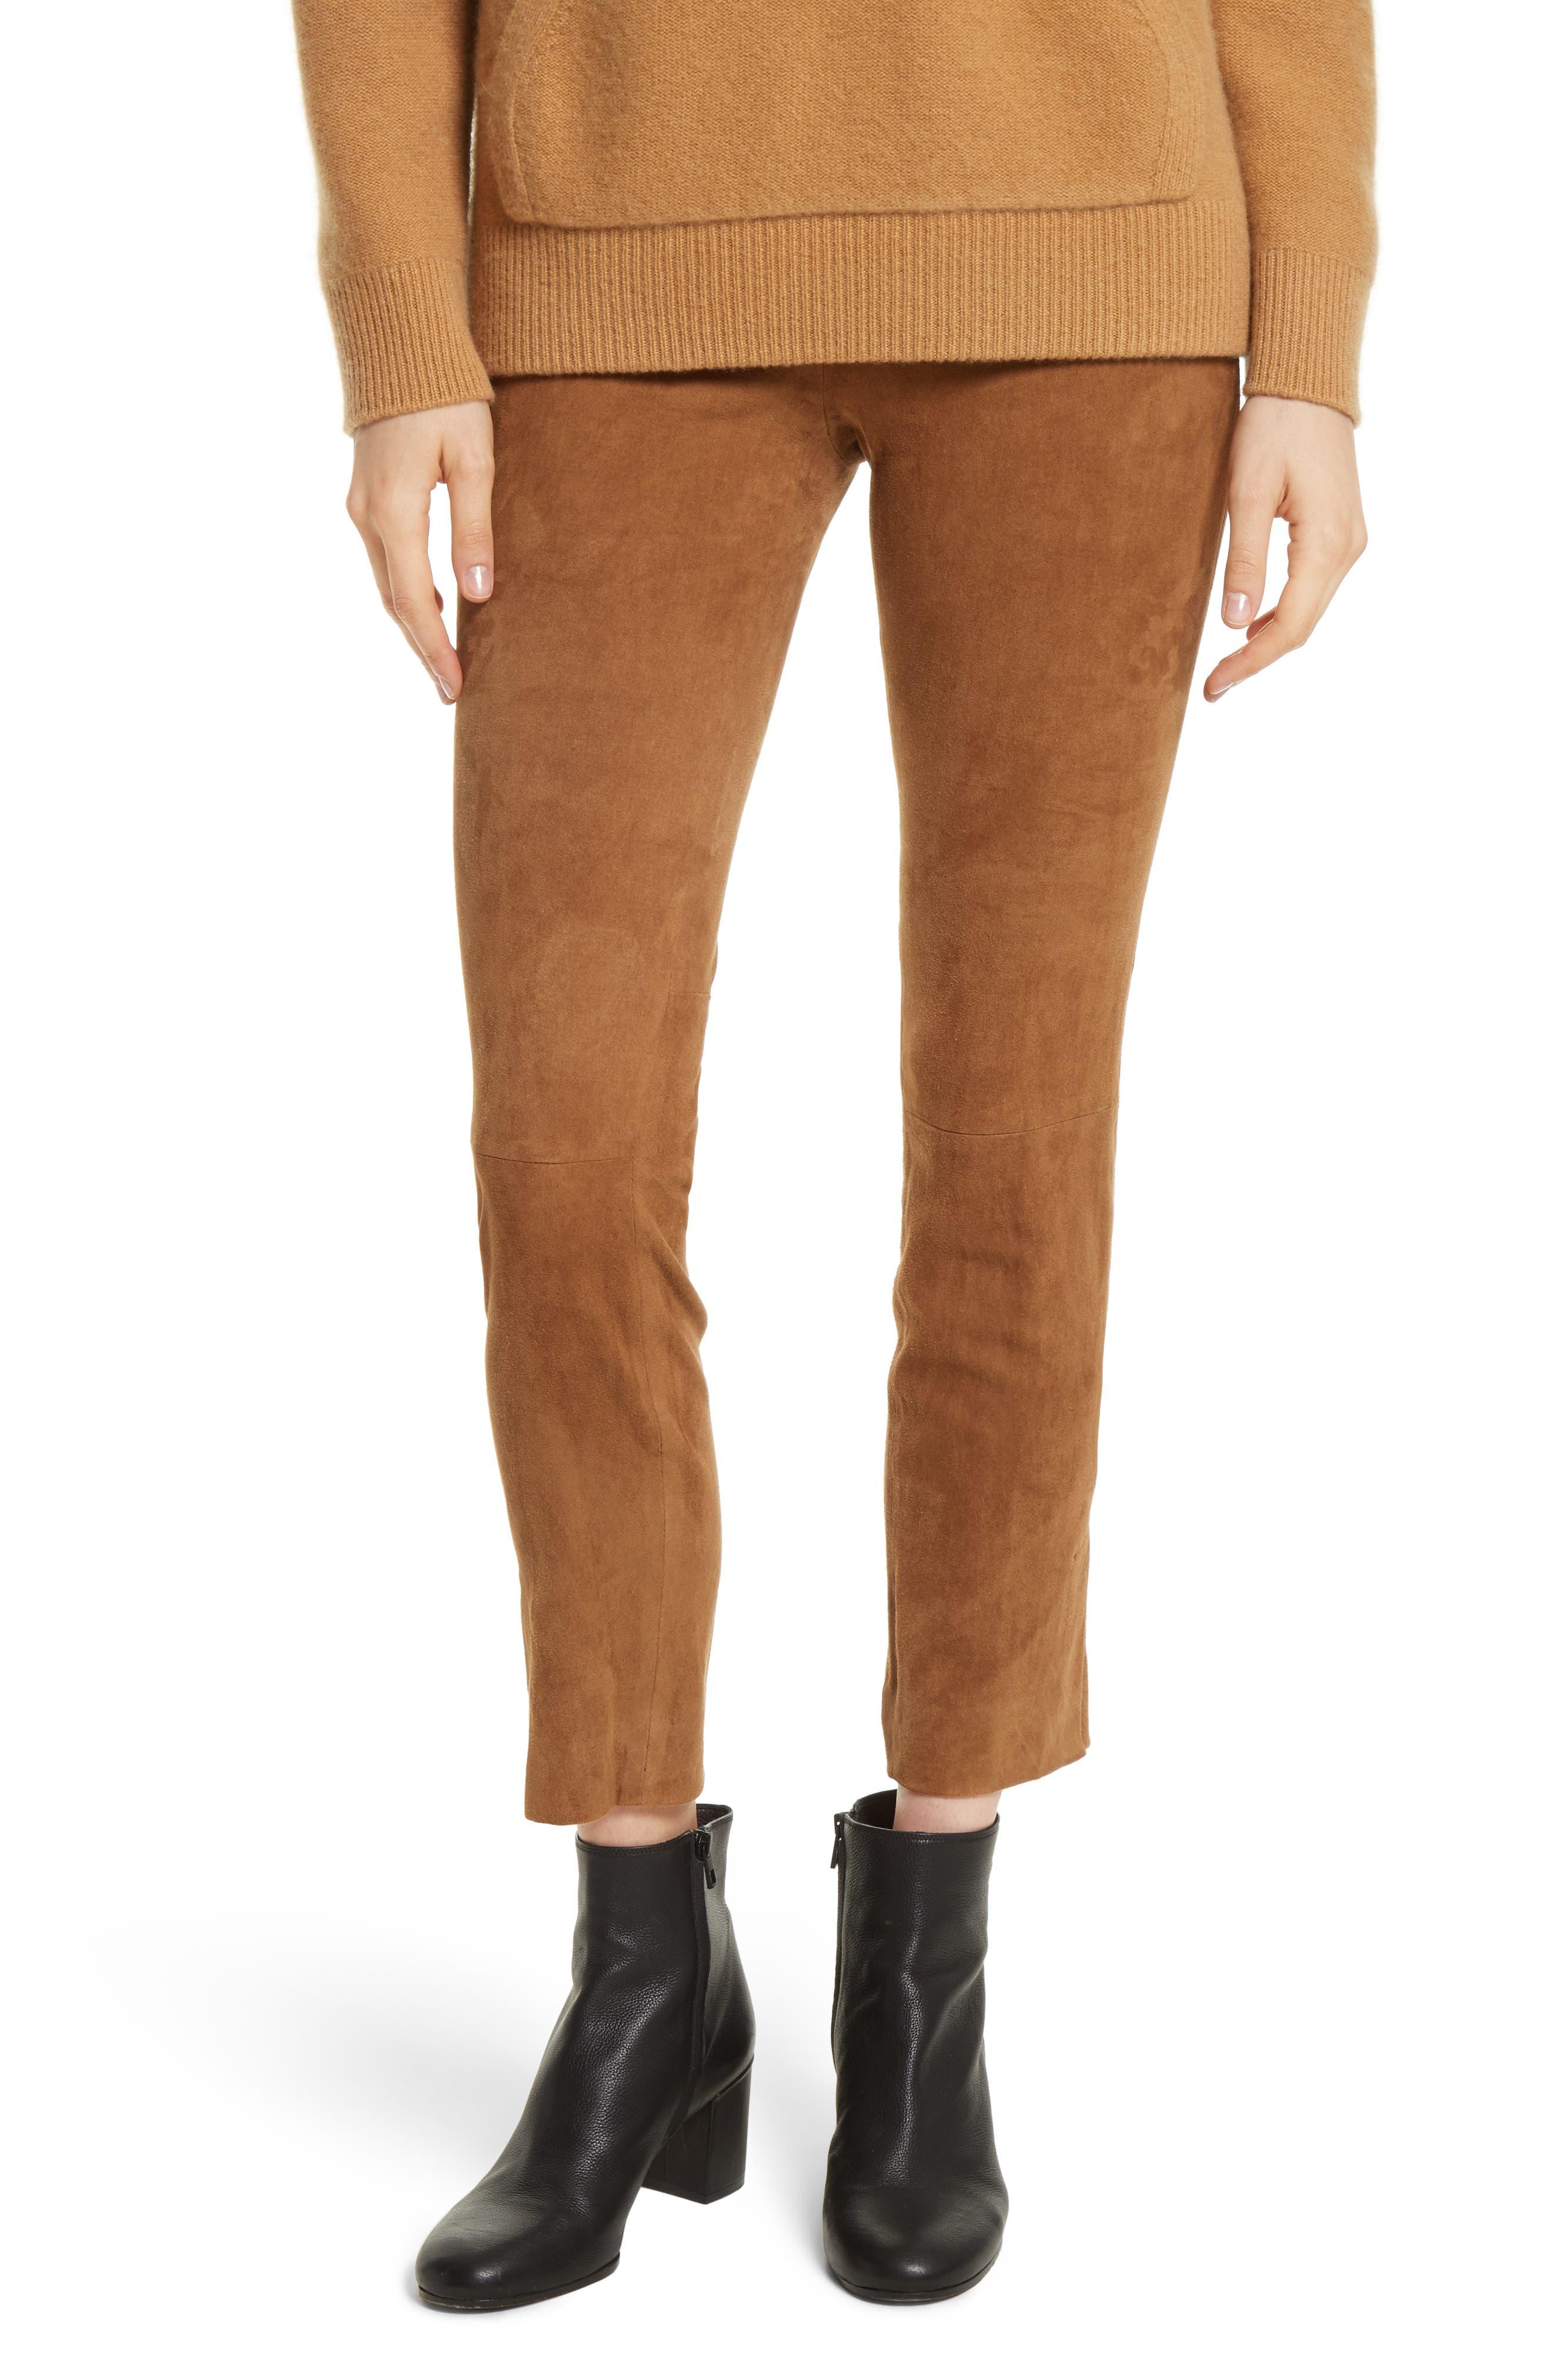 Vince Stretch Suede Crop Pants